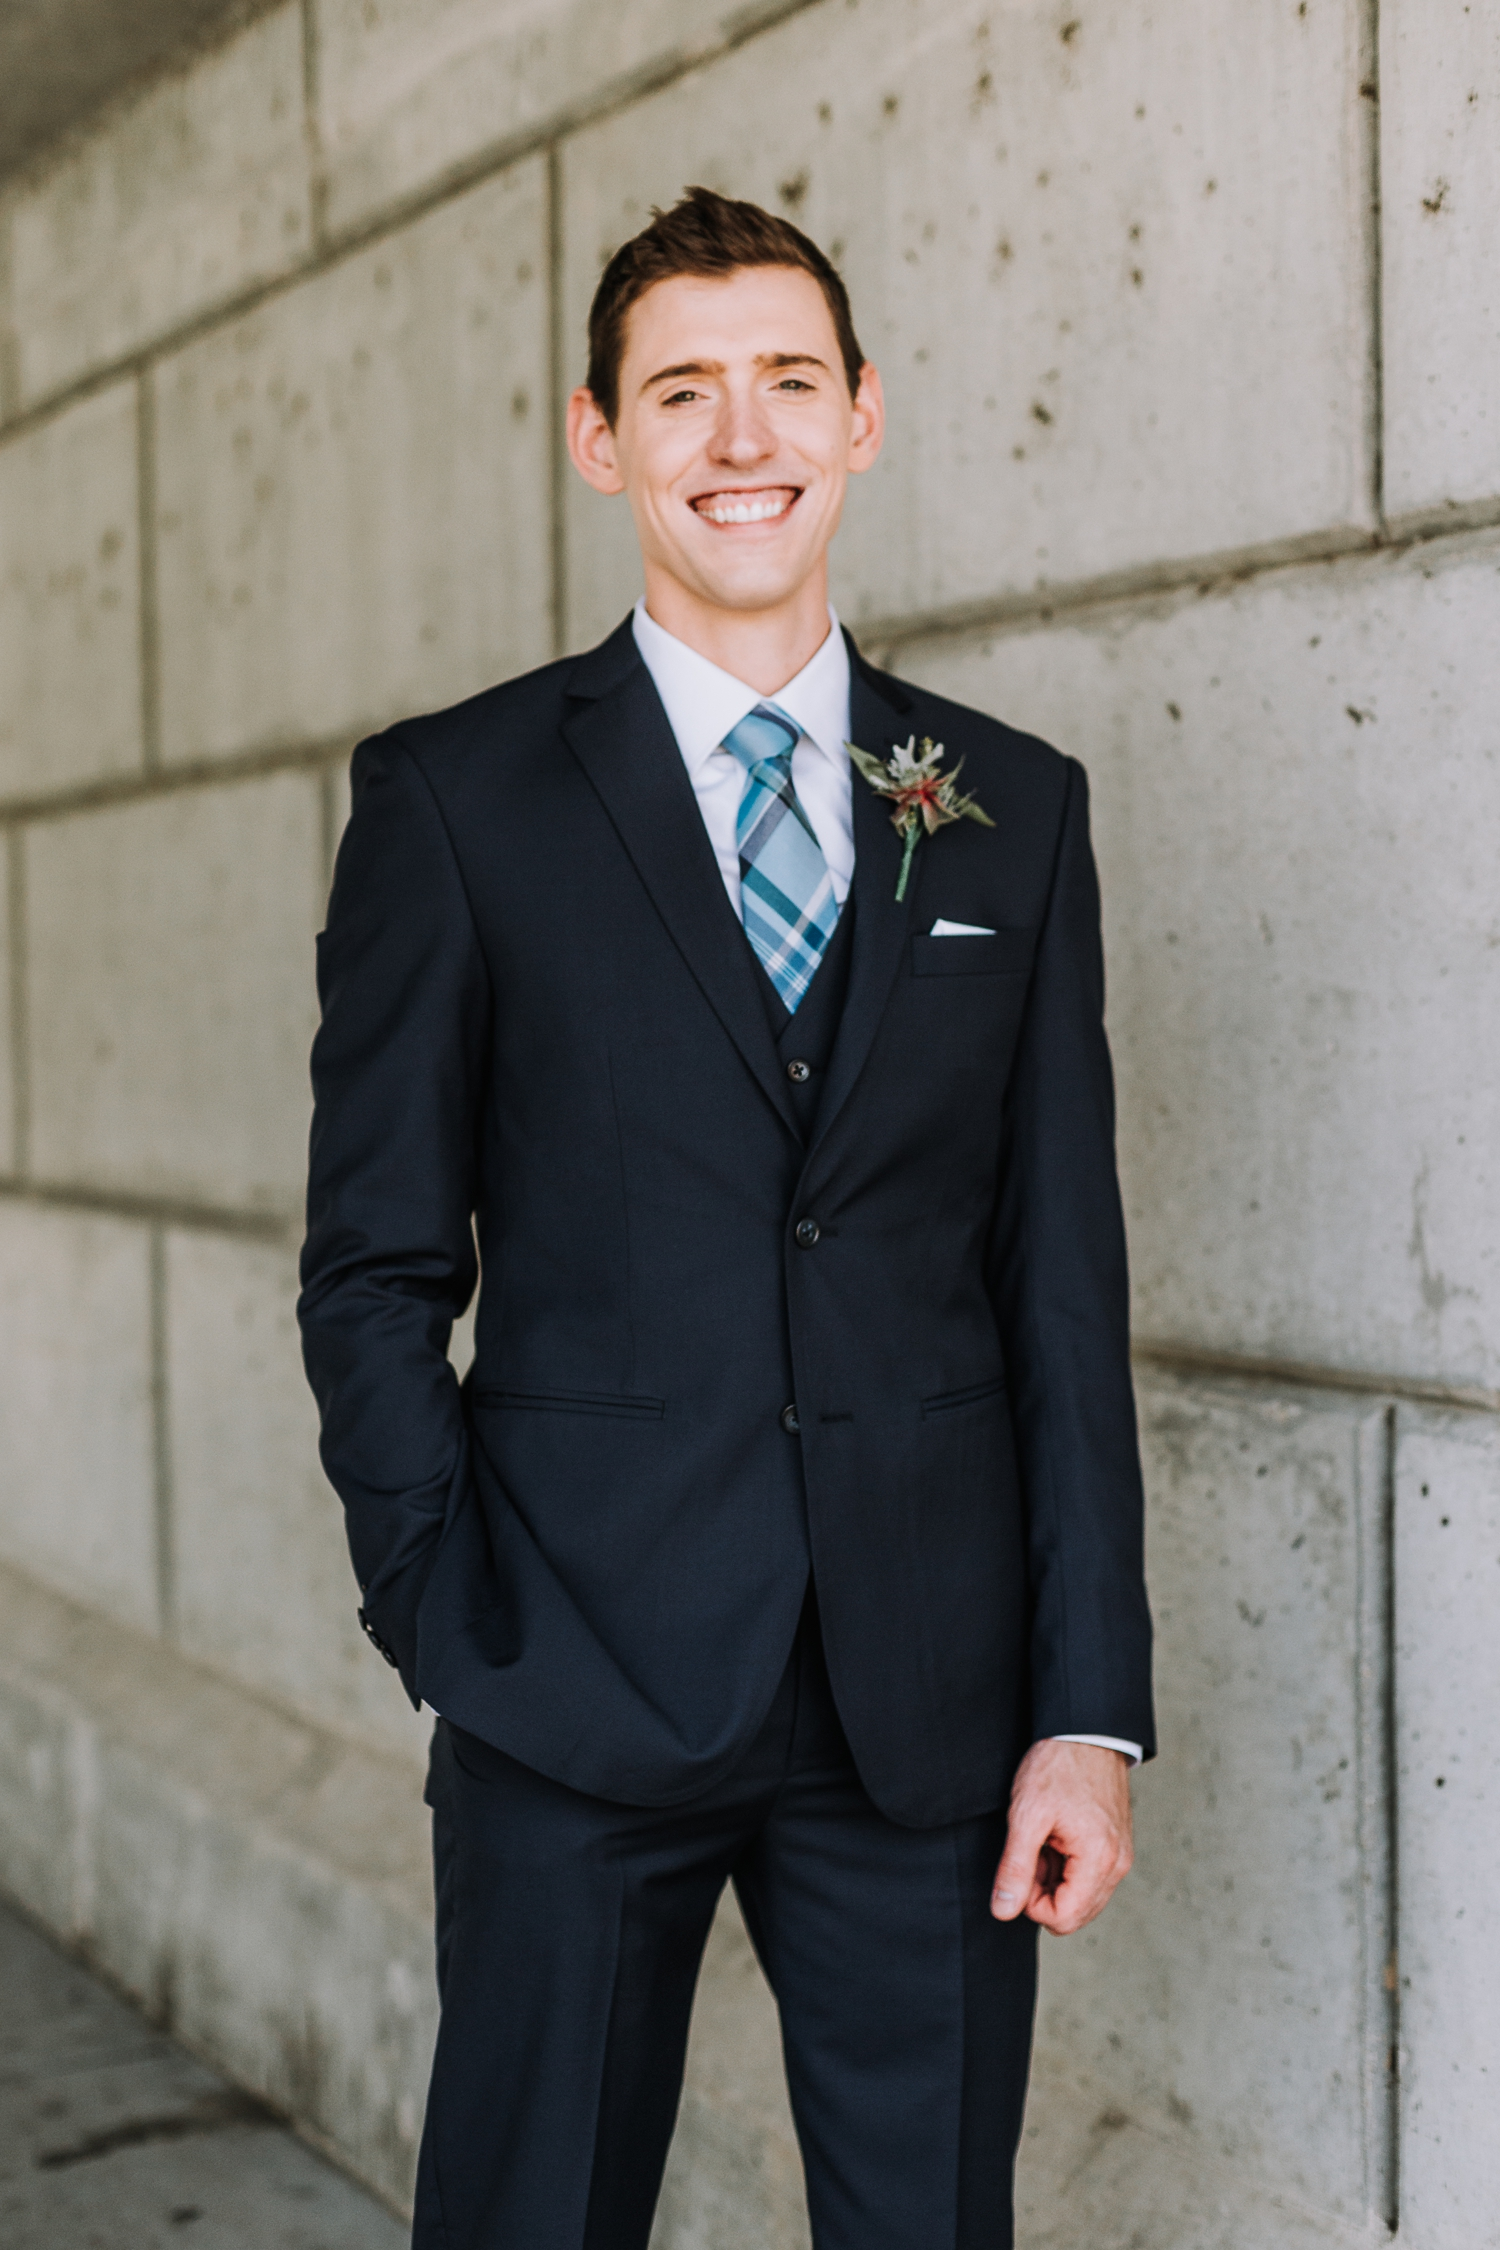 Gorgeous Wedding Photos - Classic Indianapolis Wedding - Canal 337 Wedding - The Overwhelmed Bride Wedding Blog